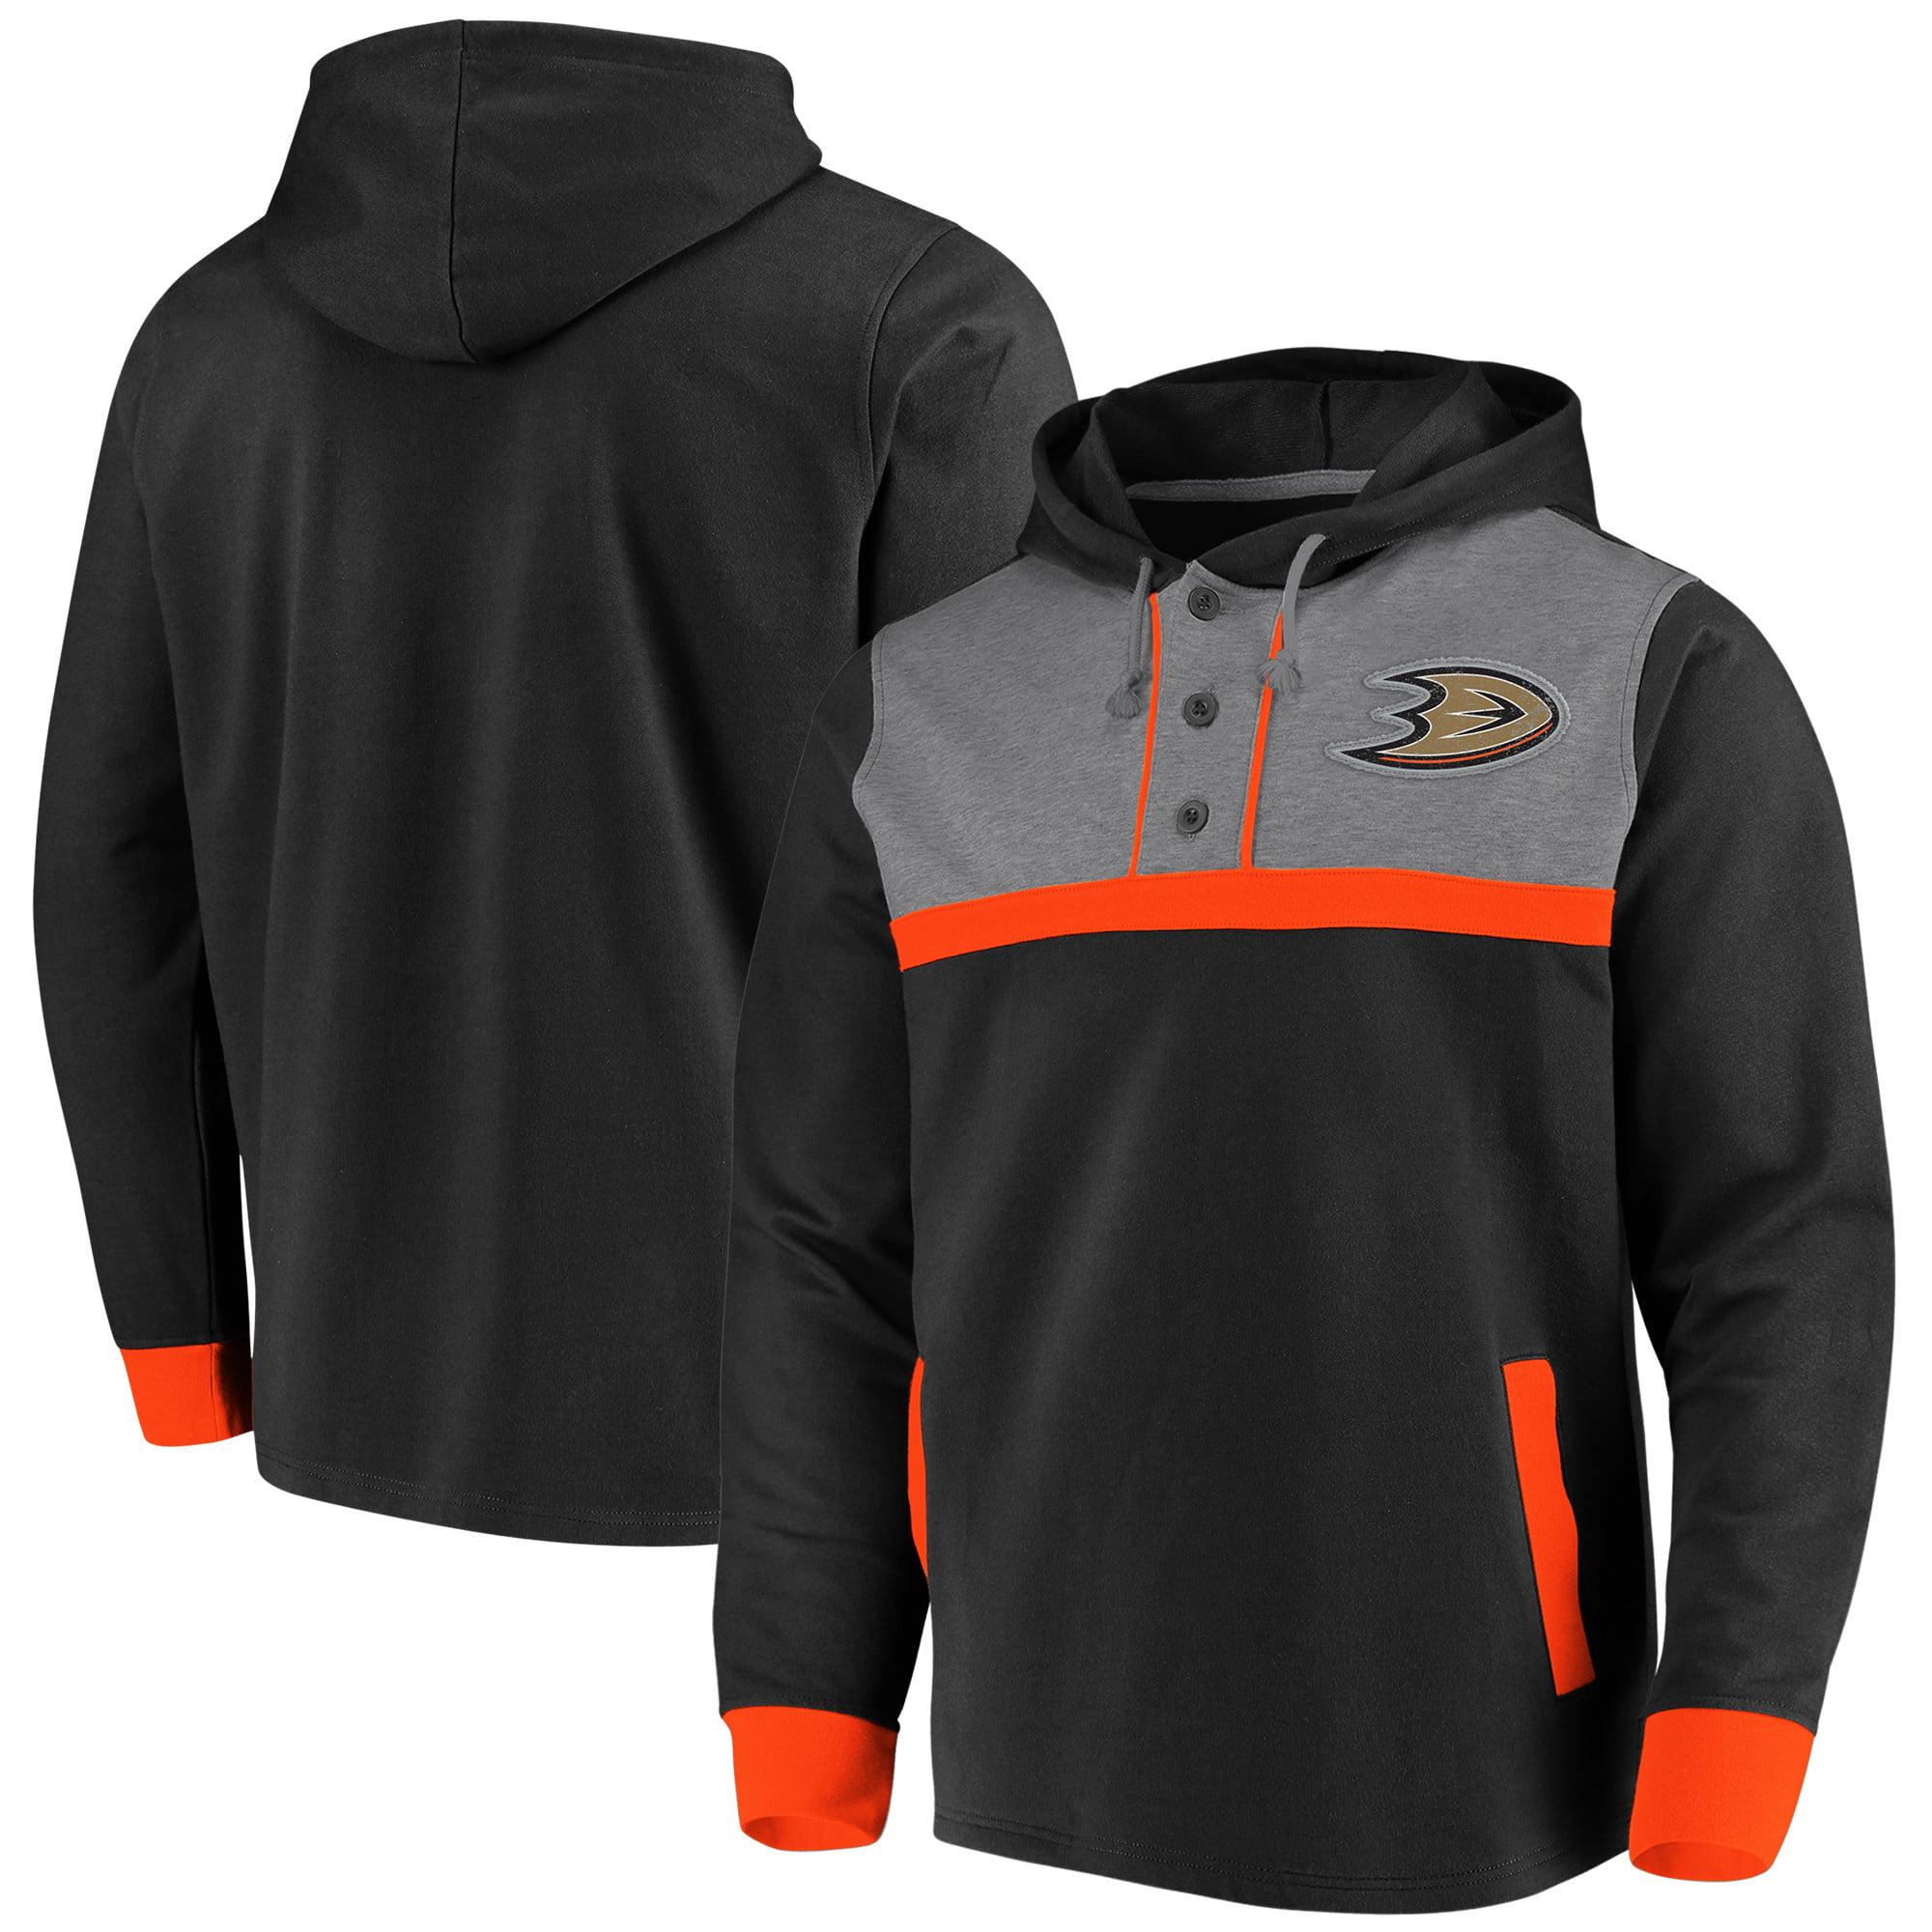 Anaheim Ducks Fanatics Branded True Classics 3-Button Pullover Hoodie - Black/Heathered Gray